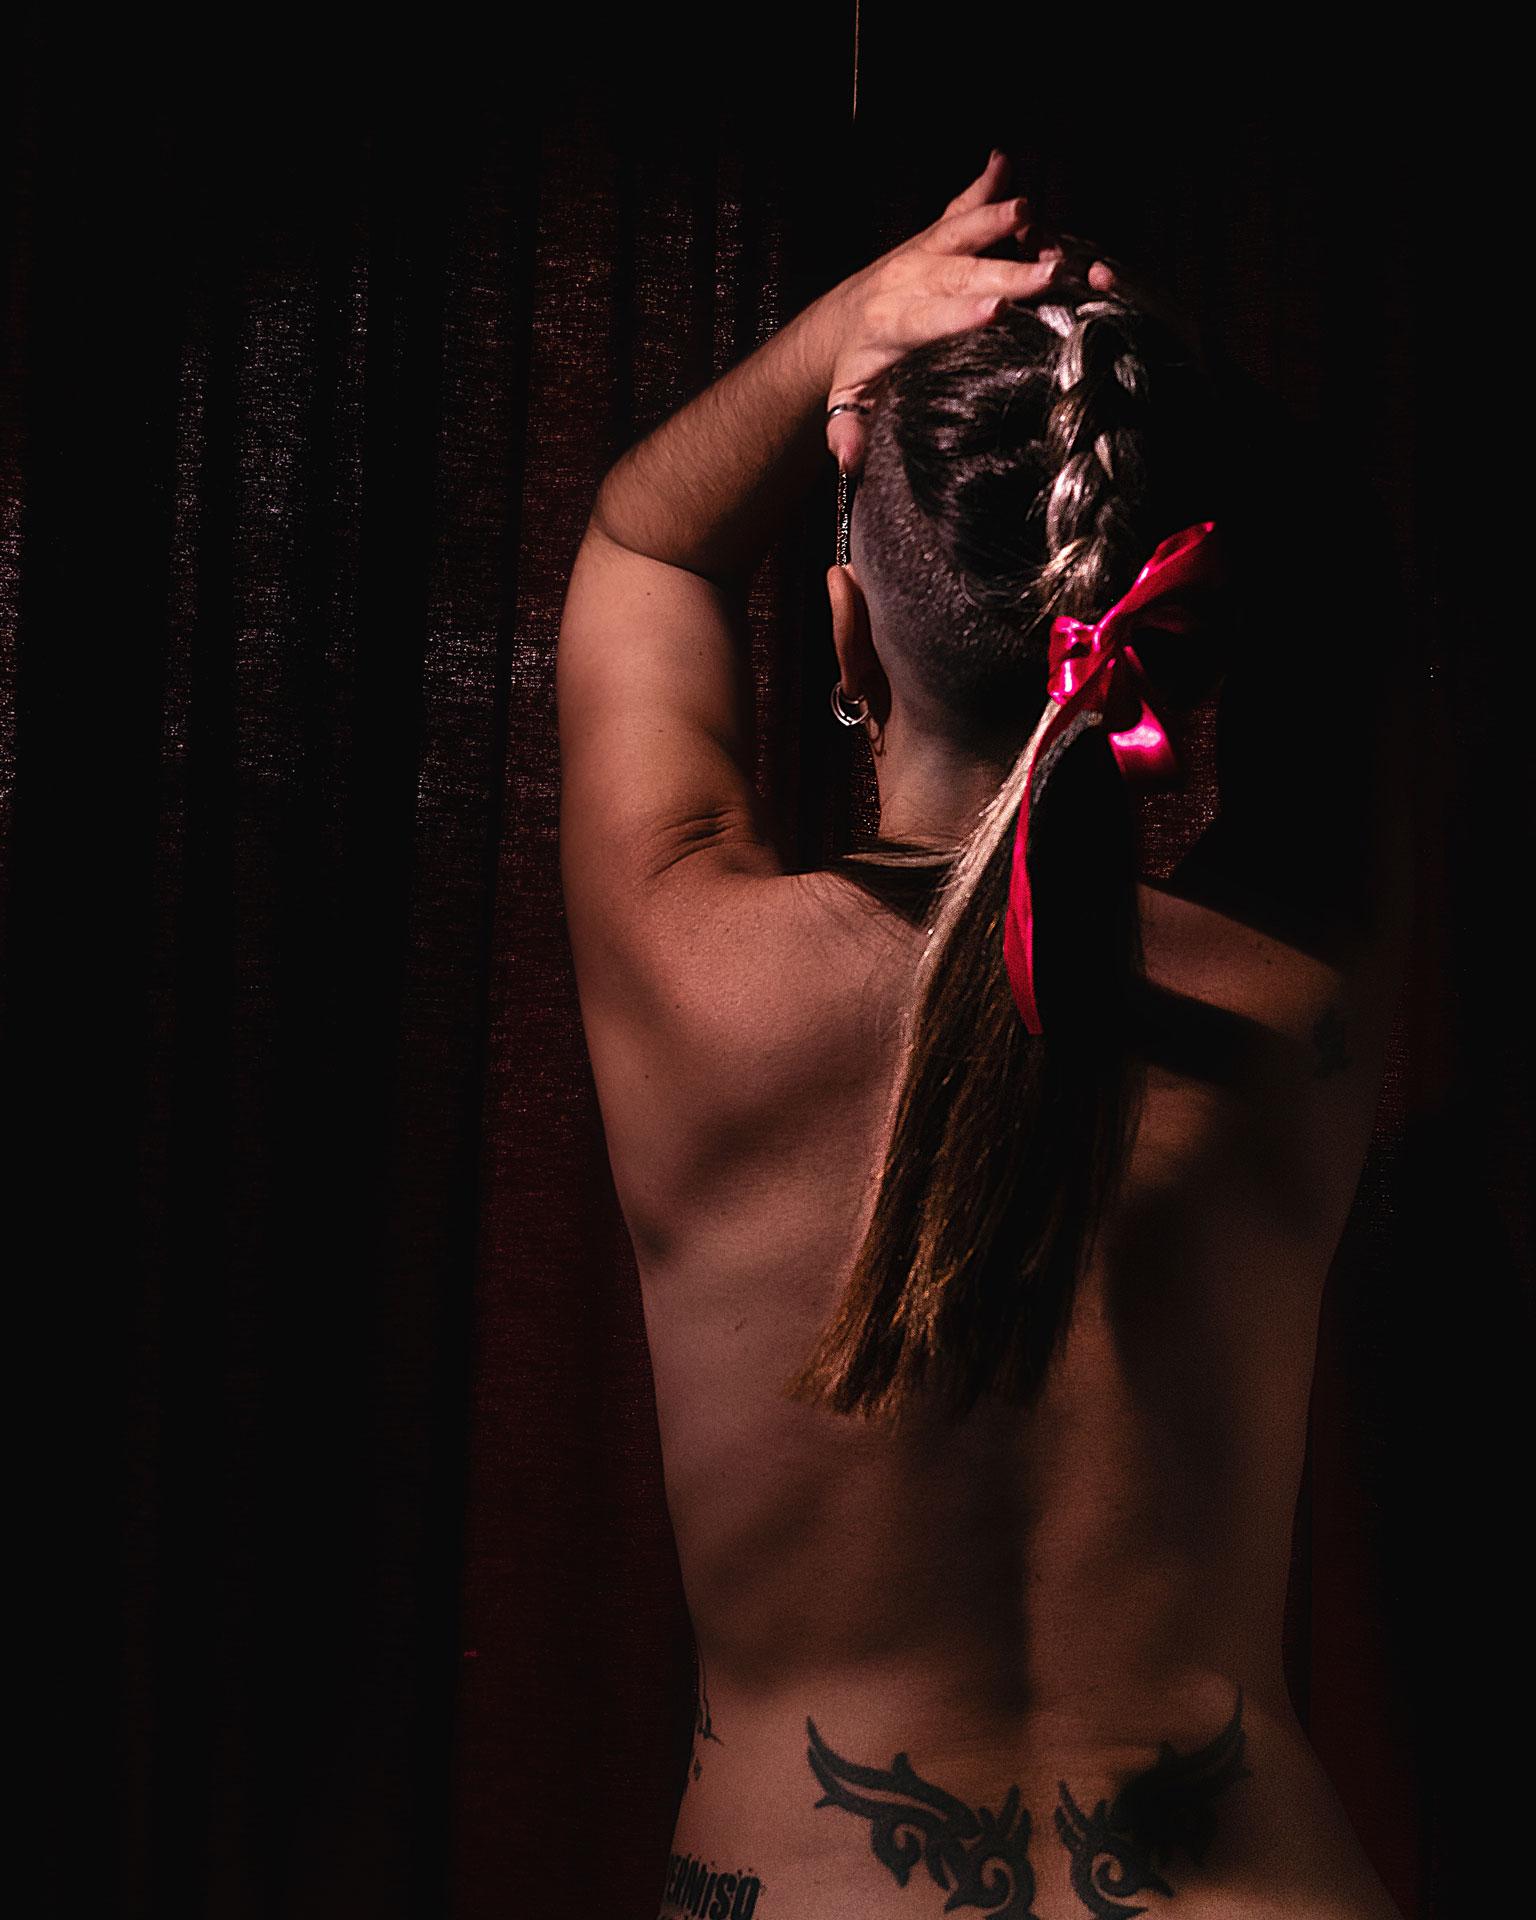 mujer espalda desnuda trenza y lazo fucsia